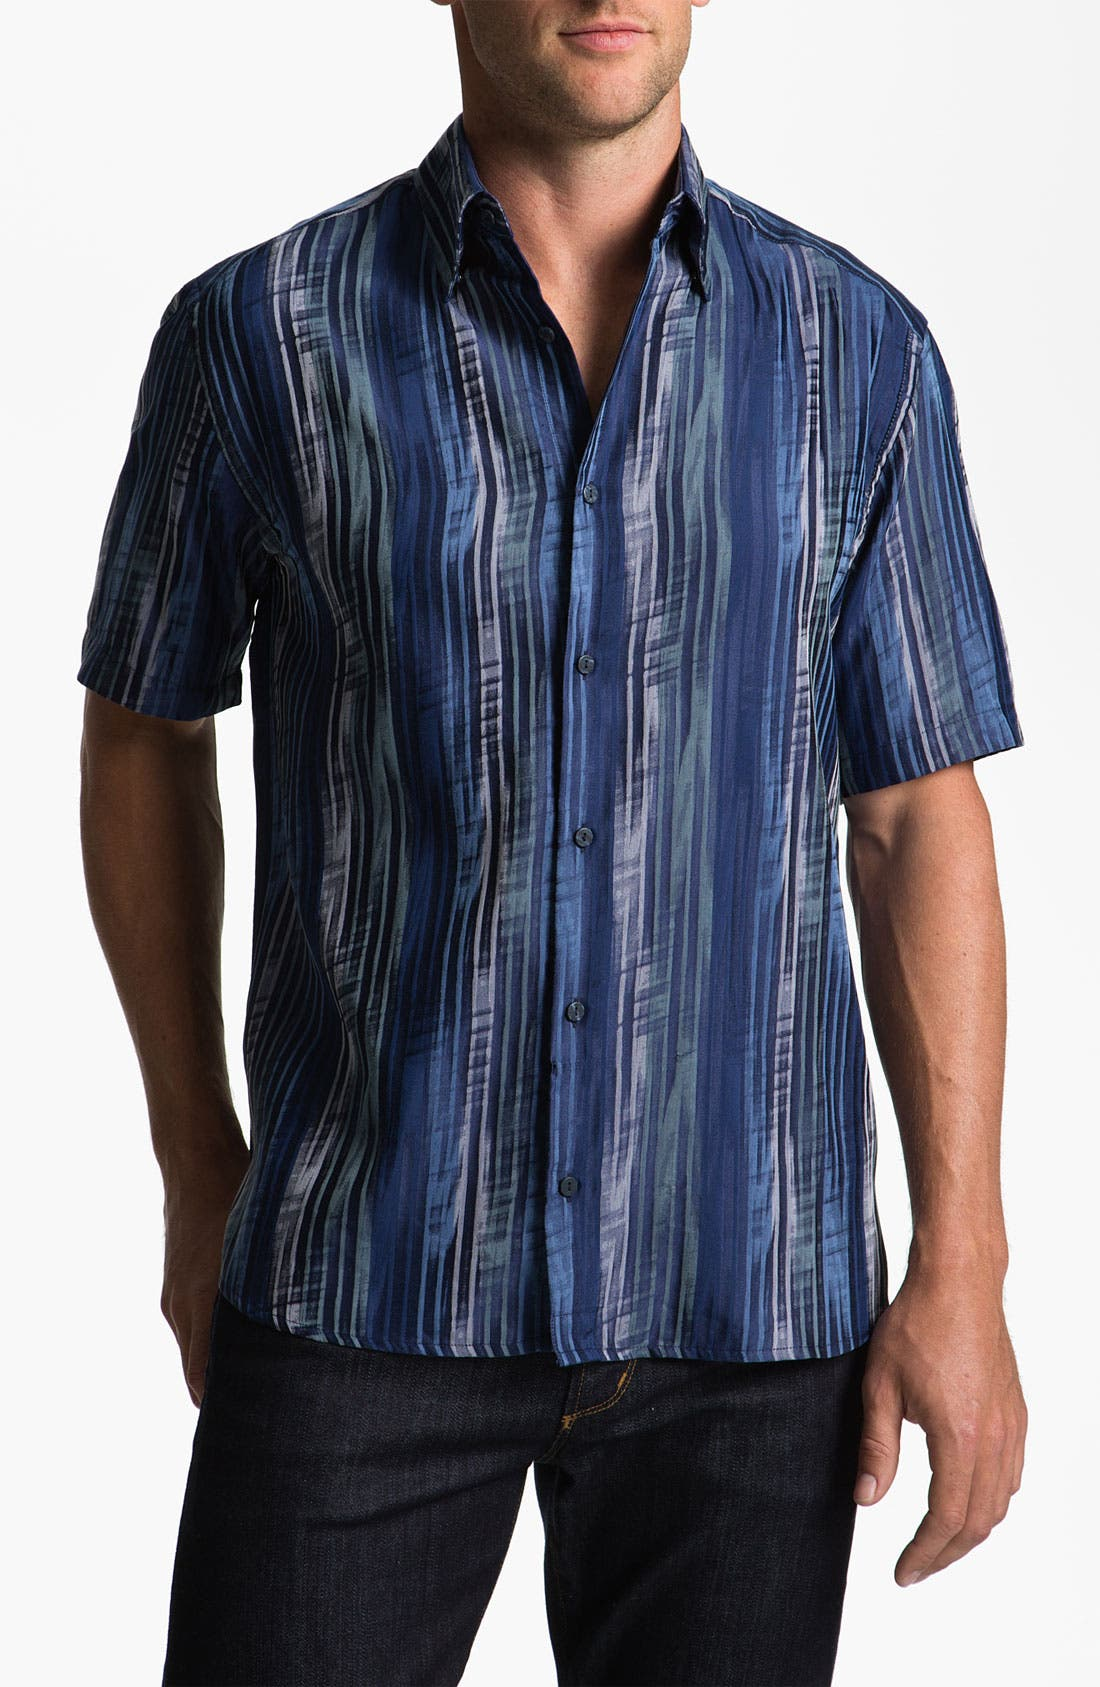 Alternate Image 1 Selected - Jhane Barnes Collection 'Striate' Cotton & Silk Sport Shirt